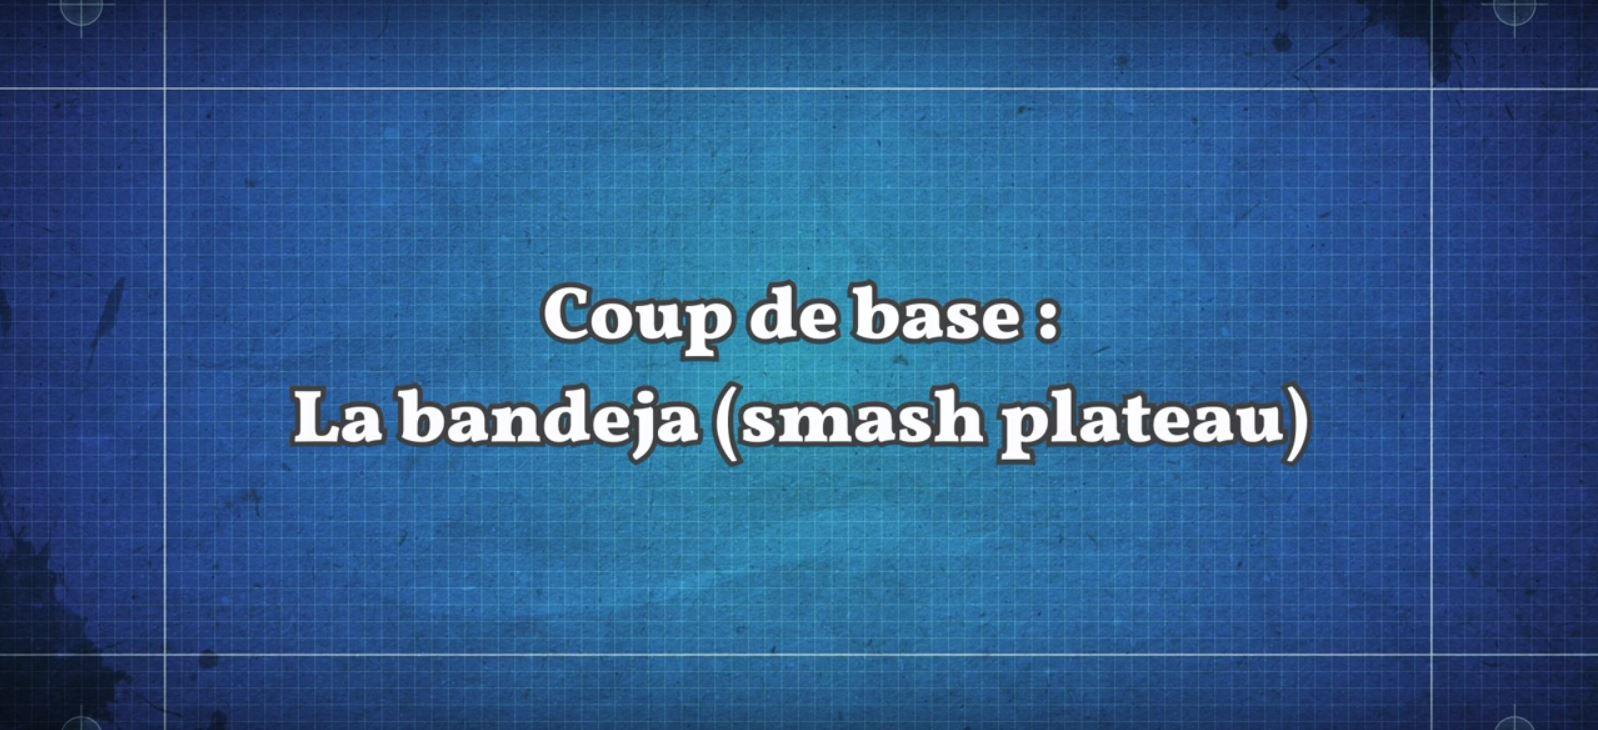 La bandeja (Smash plateau)